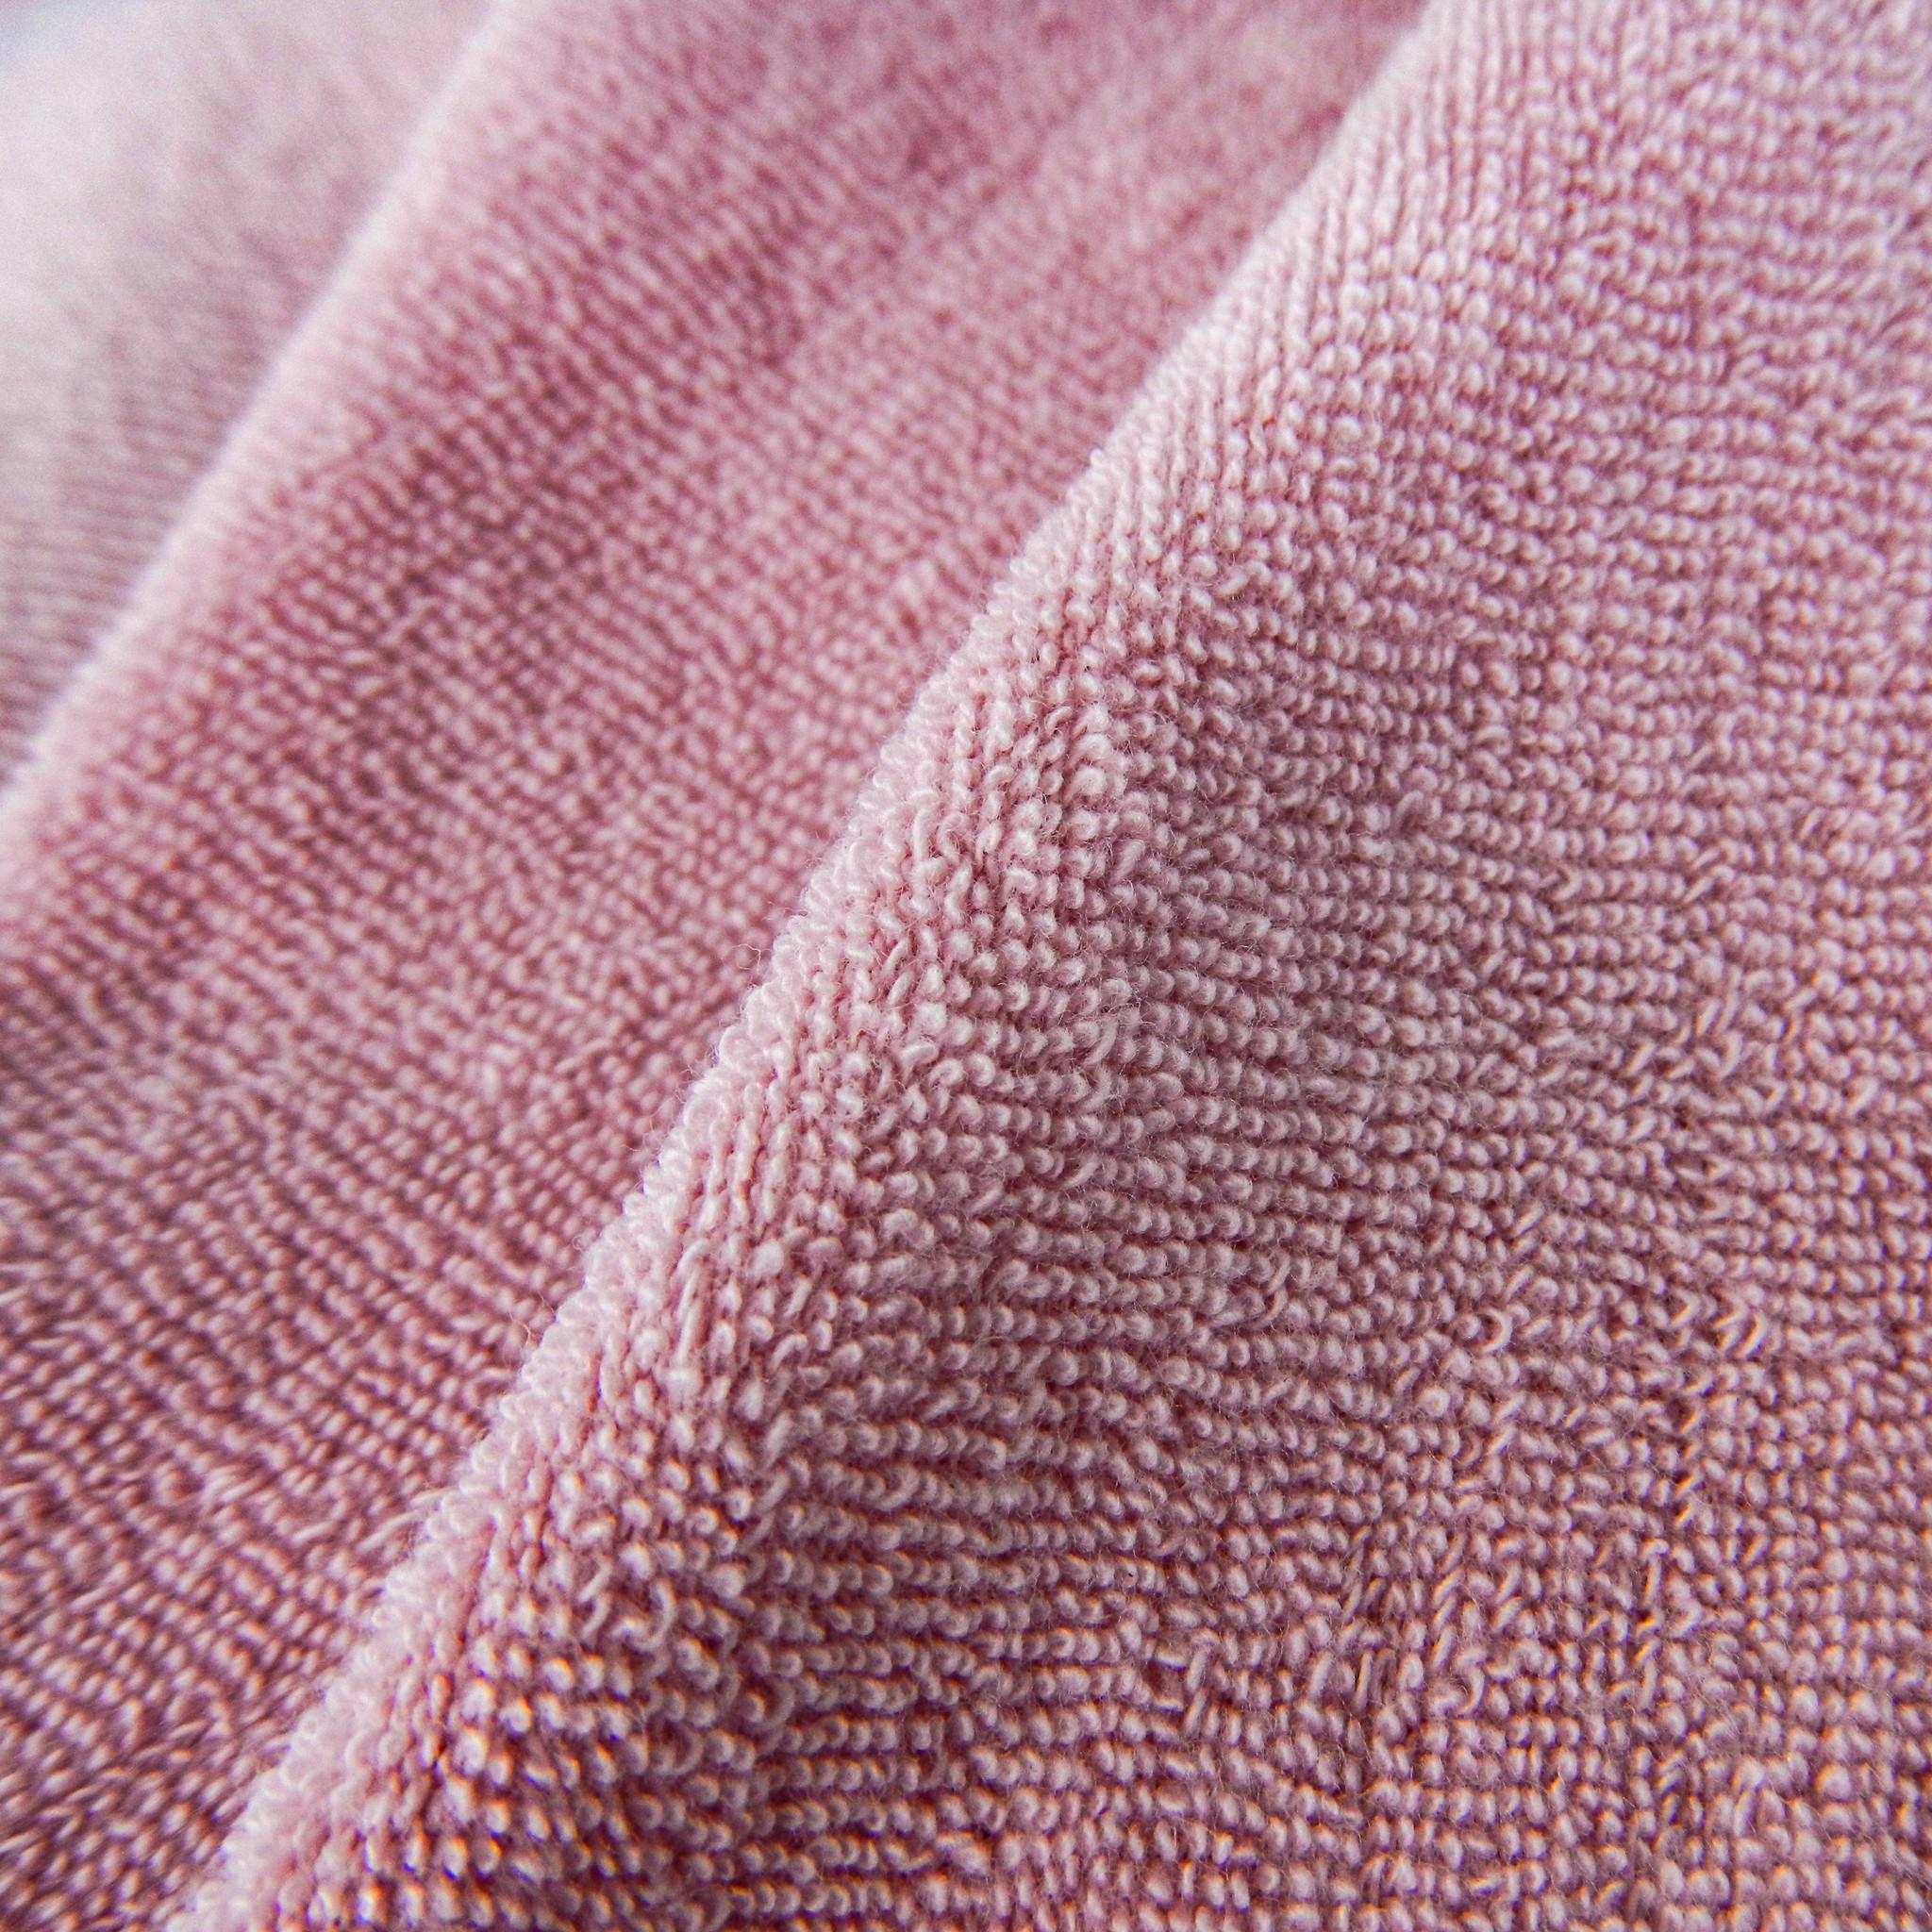 Gestrickte Frottewaren - rosa